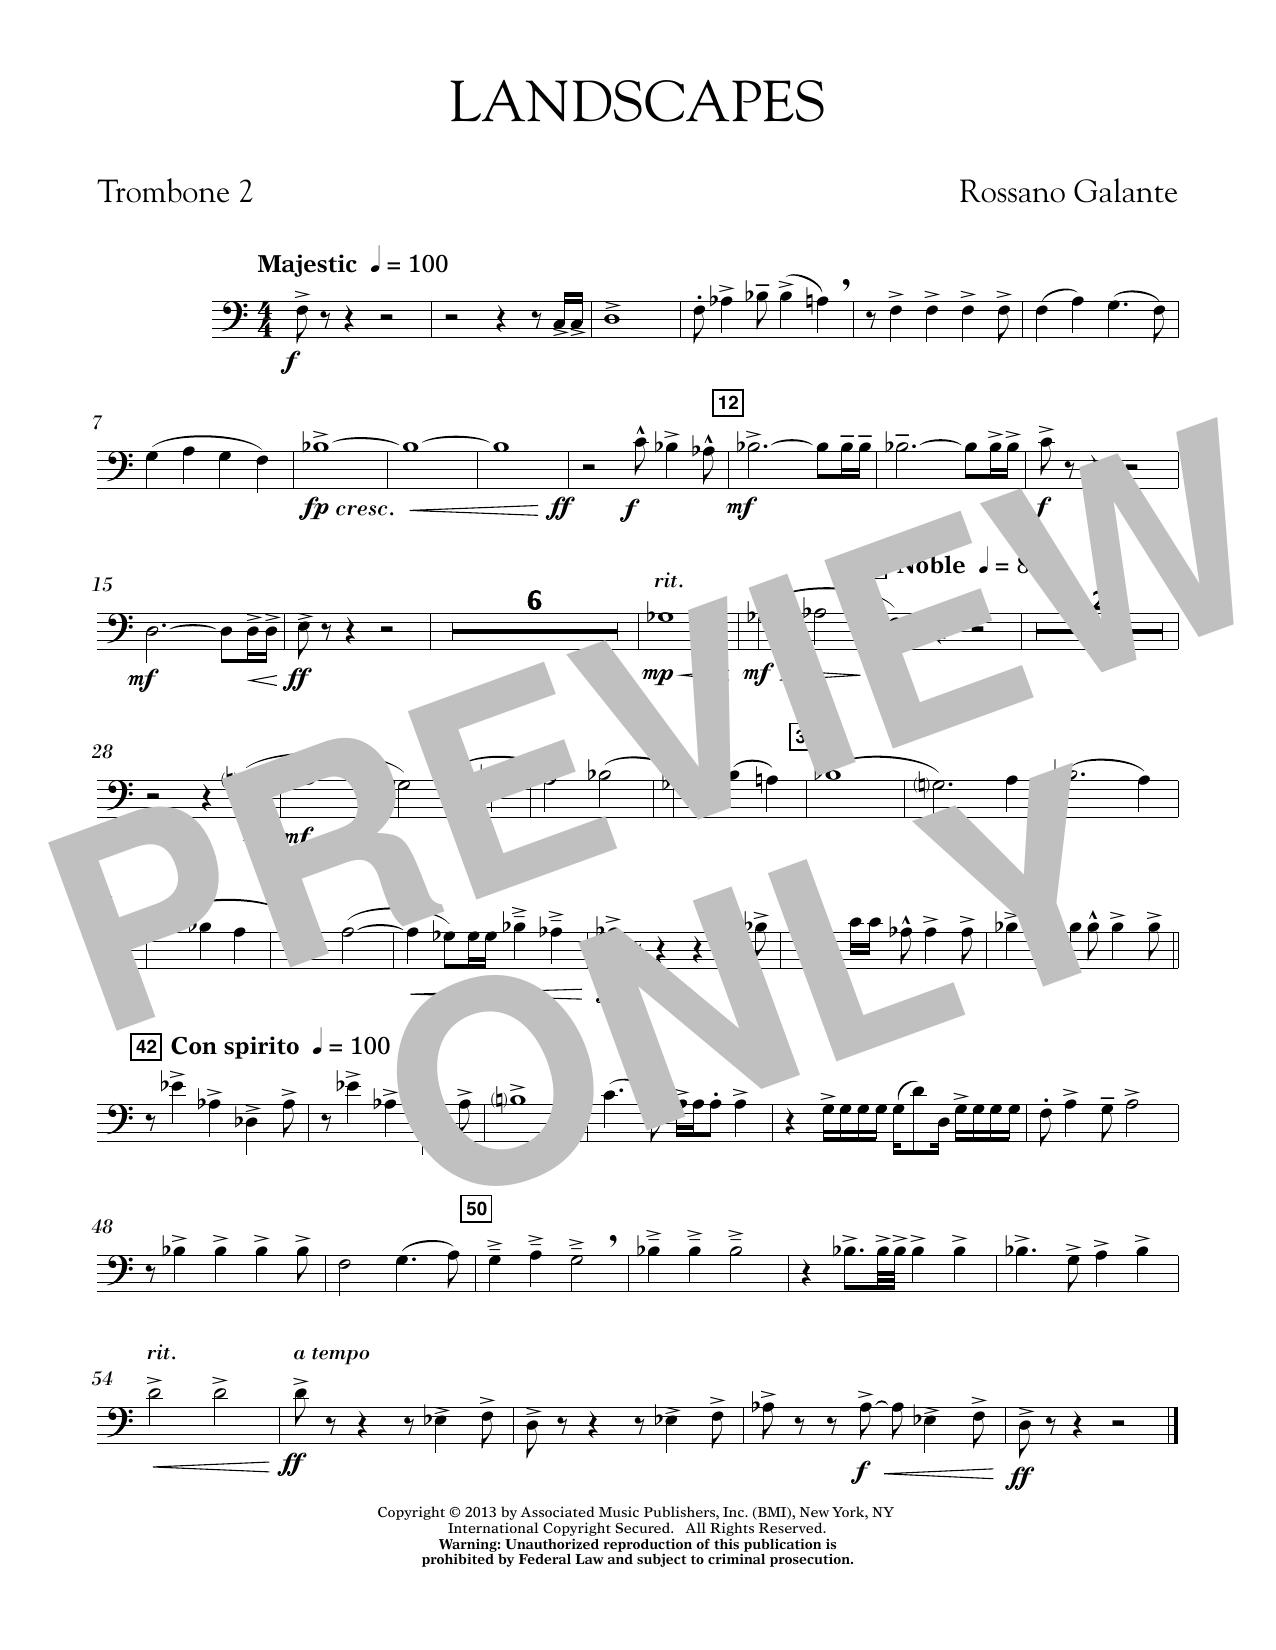 Rosanno Galante Landscapes - Trombone 2 sheet music notes printable PDF score